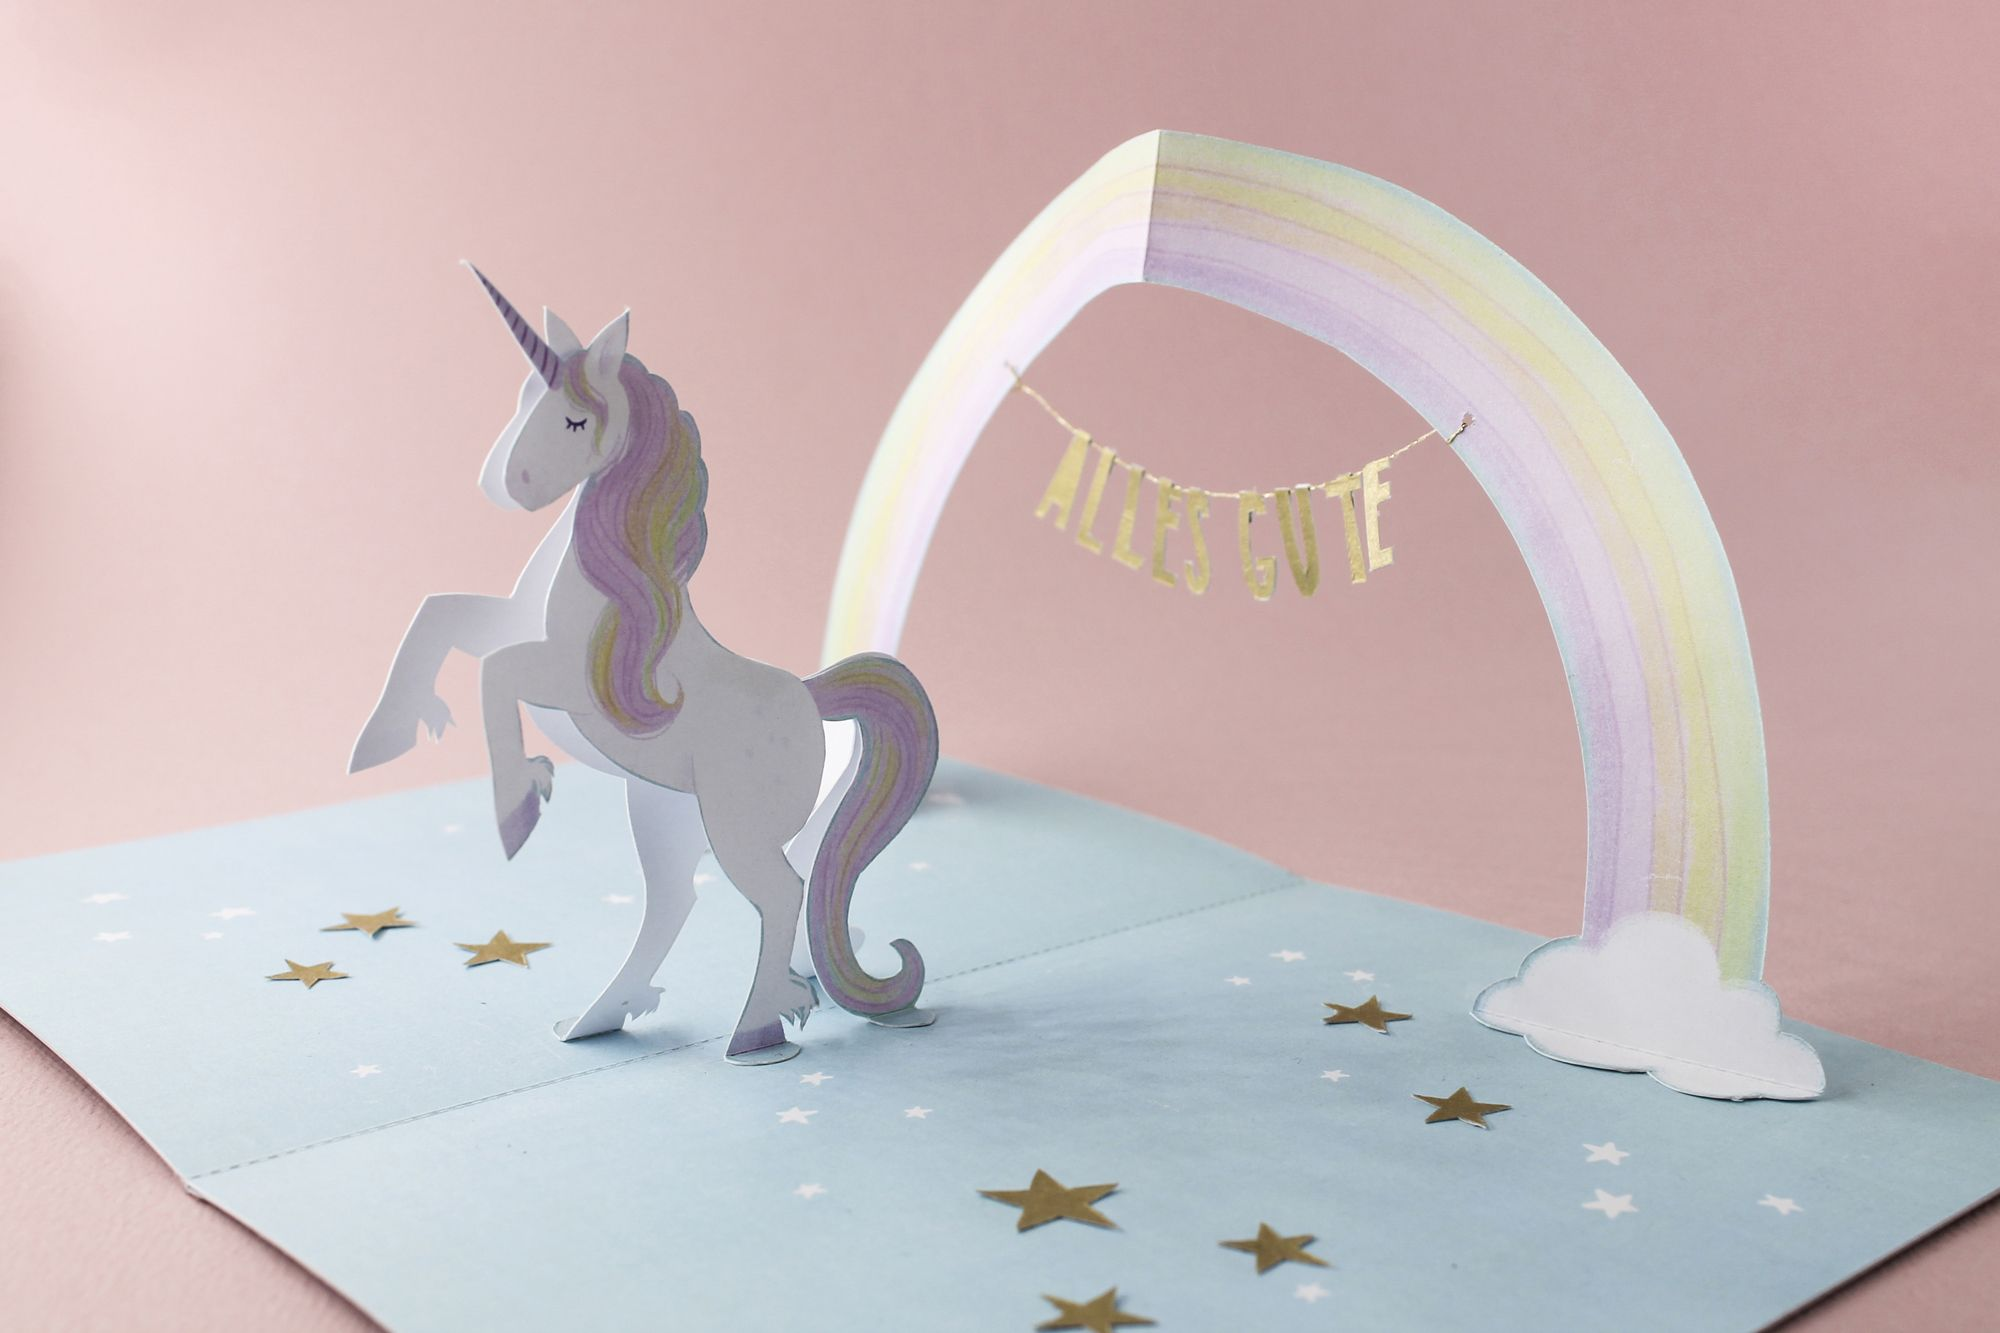 Unicorn Pop Up Birthday Card With Golden Details Handmade Unicorn Birthday Cards Unicorn Card Birthday Card Pop Up